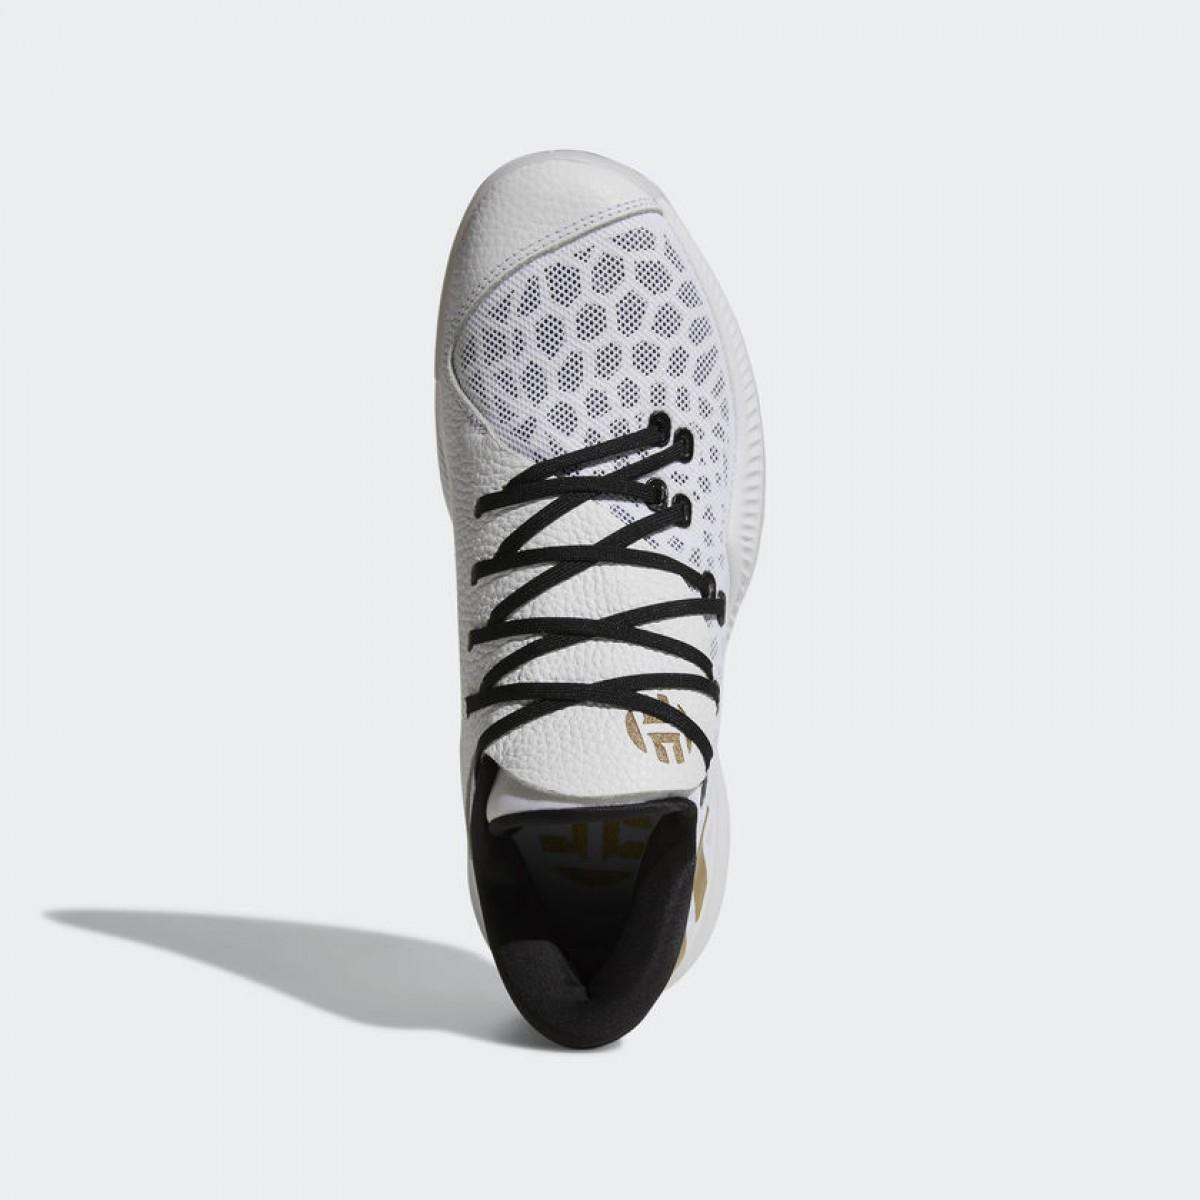 Adidas Harden B/E 'White Gold' AC7821